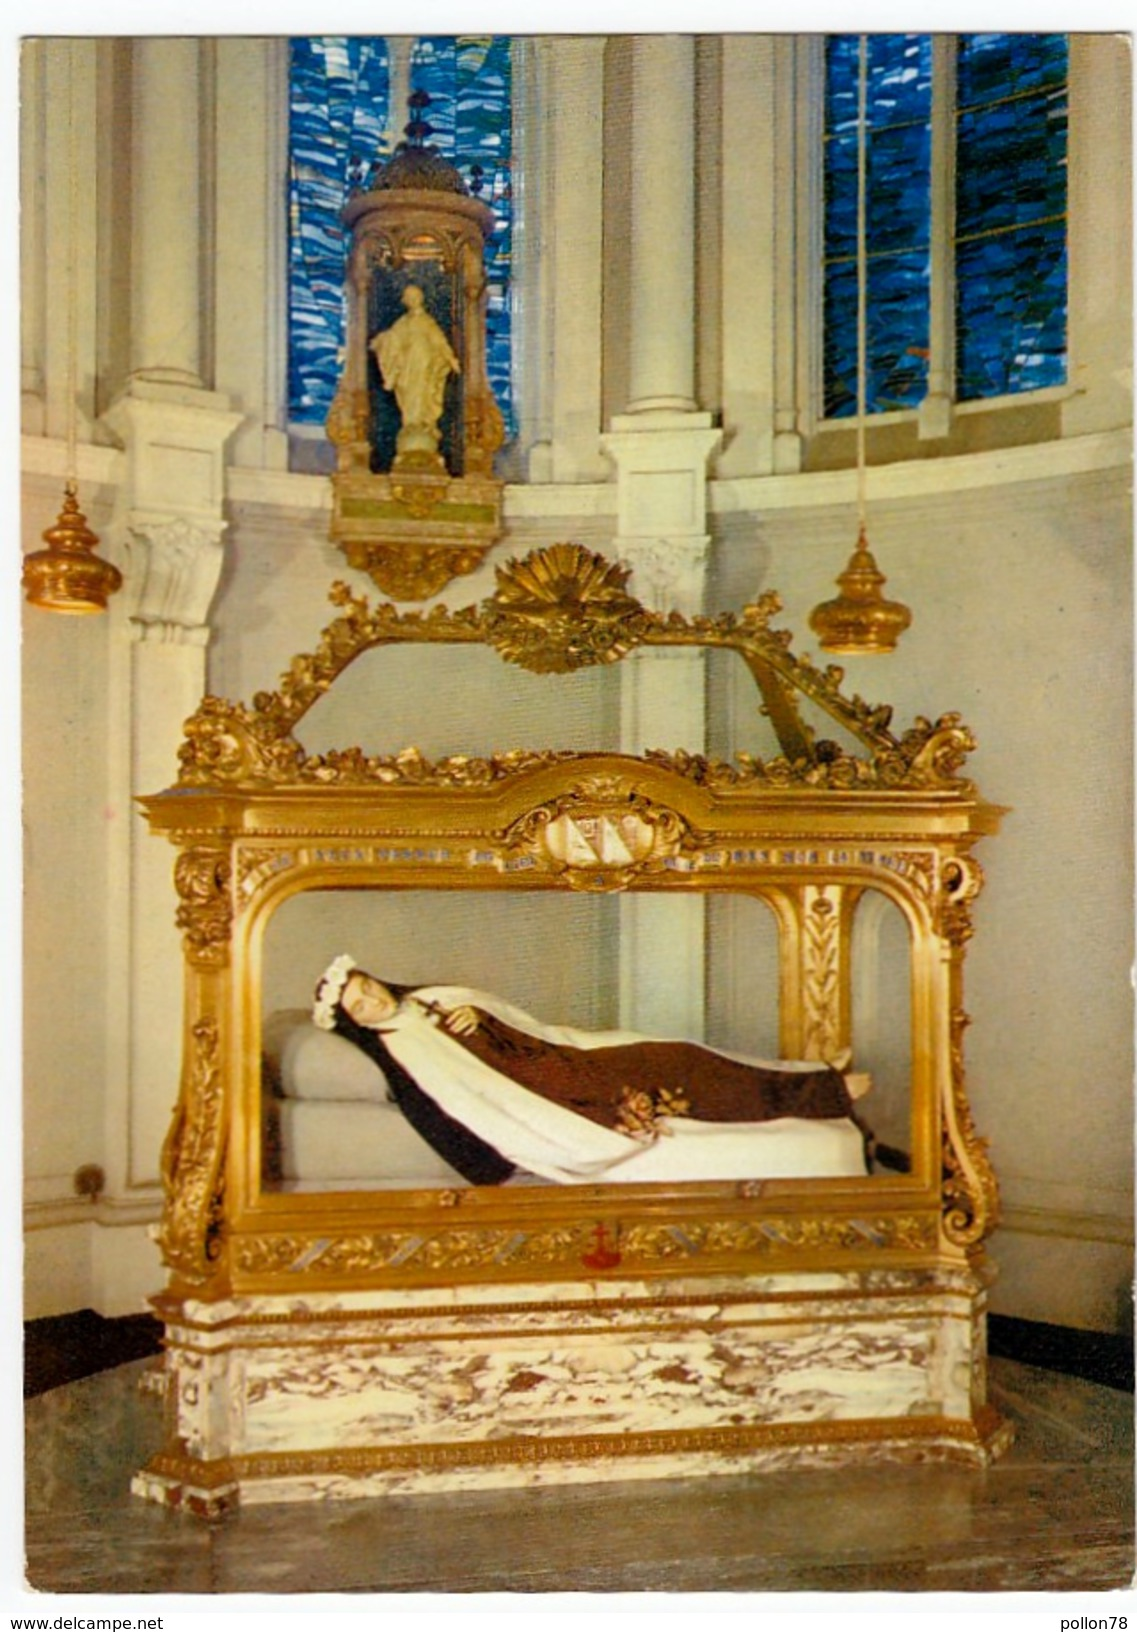 CARMEL DE LISIEUX - LA CHASSE DE Ste THERESE DE L'ENFANT-JESUS - SANTA TERESA - Vedi Retro - Santi